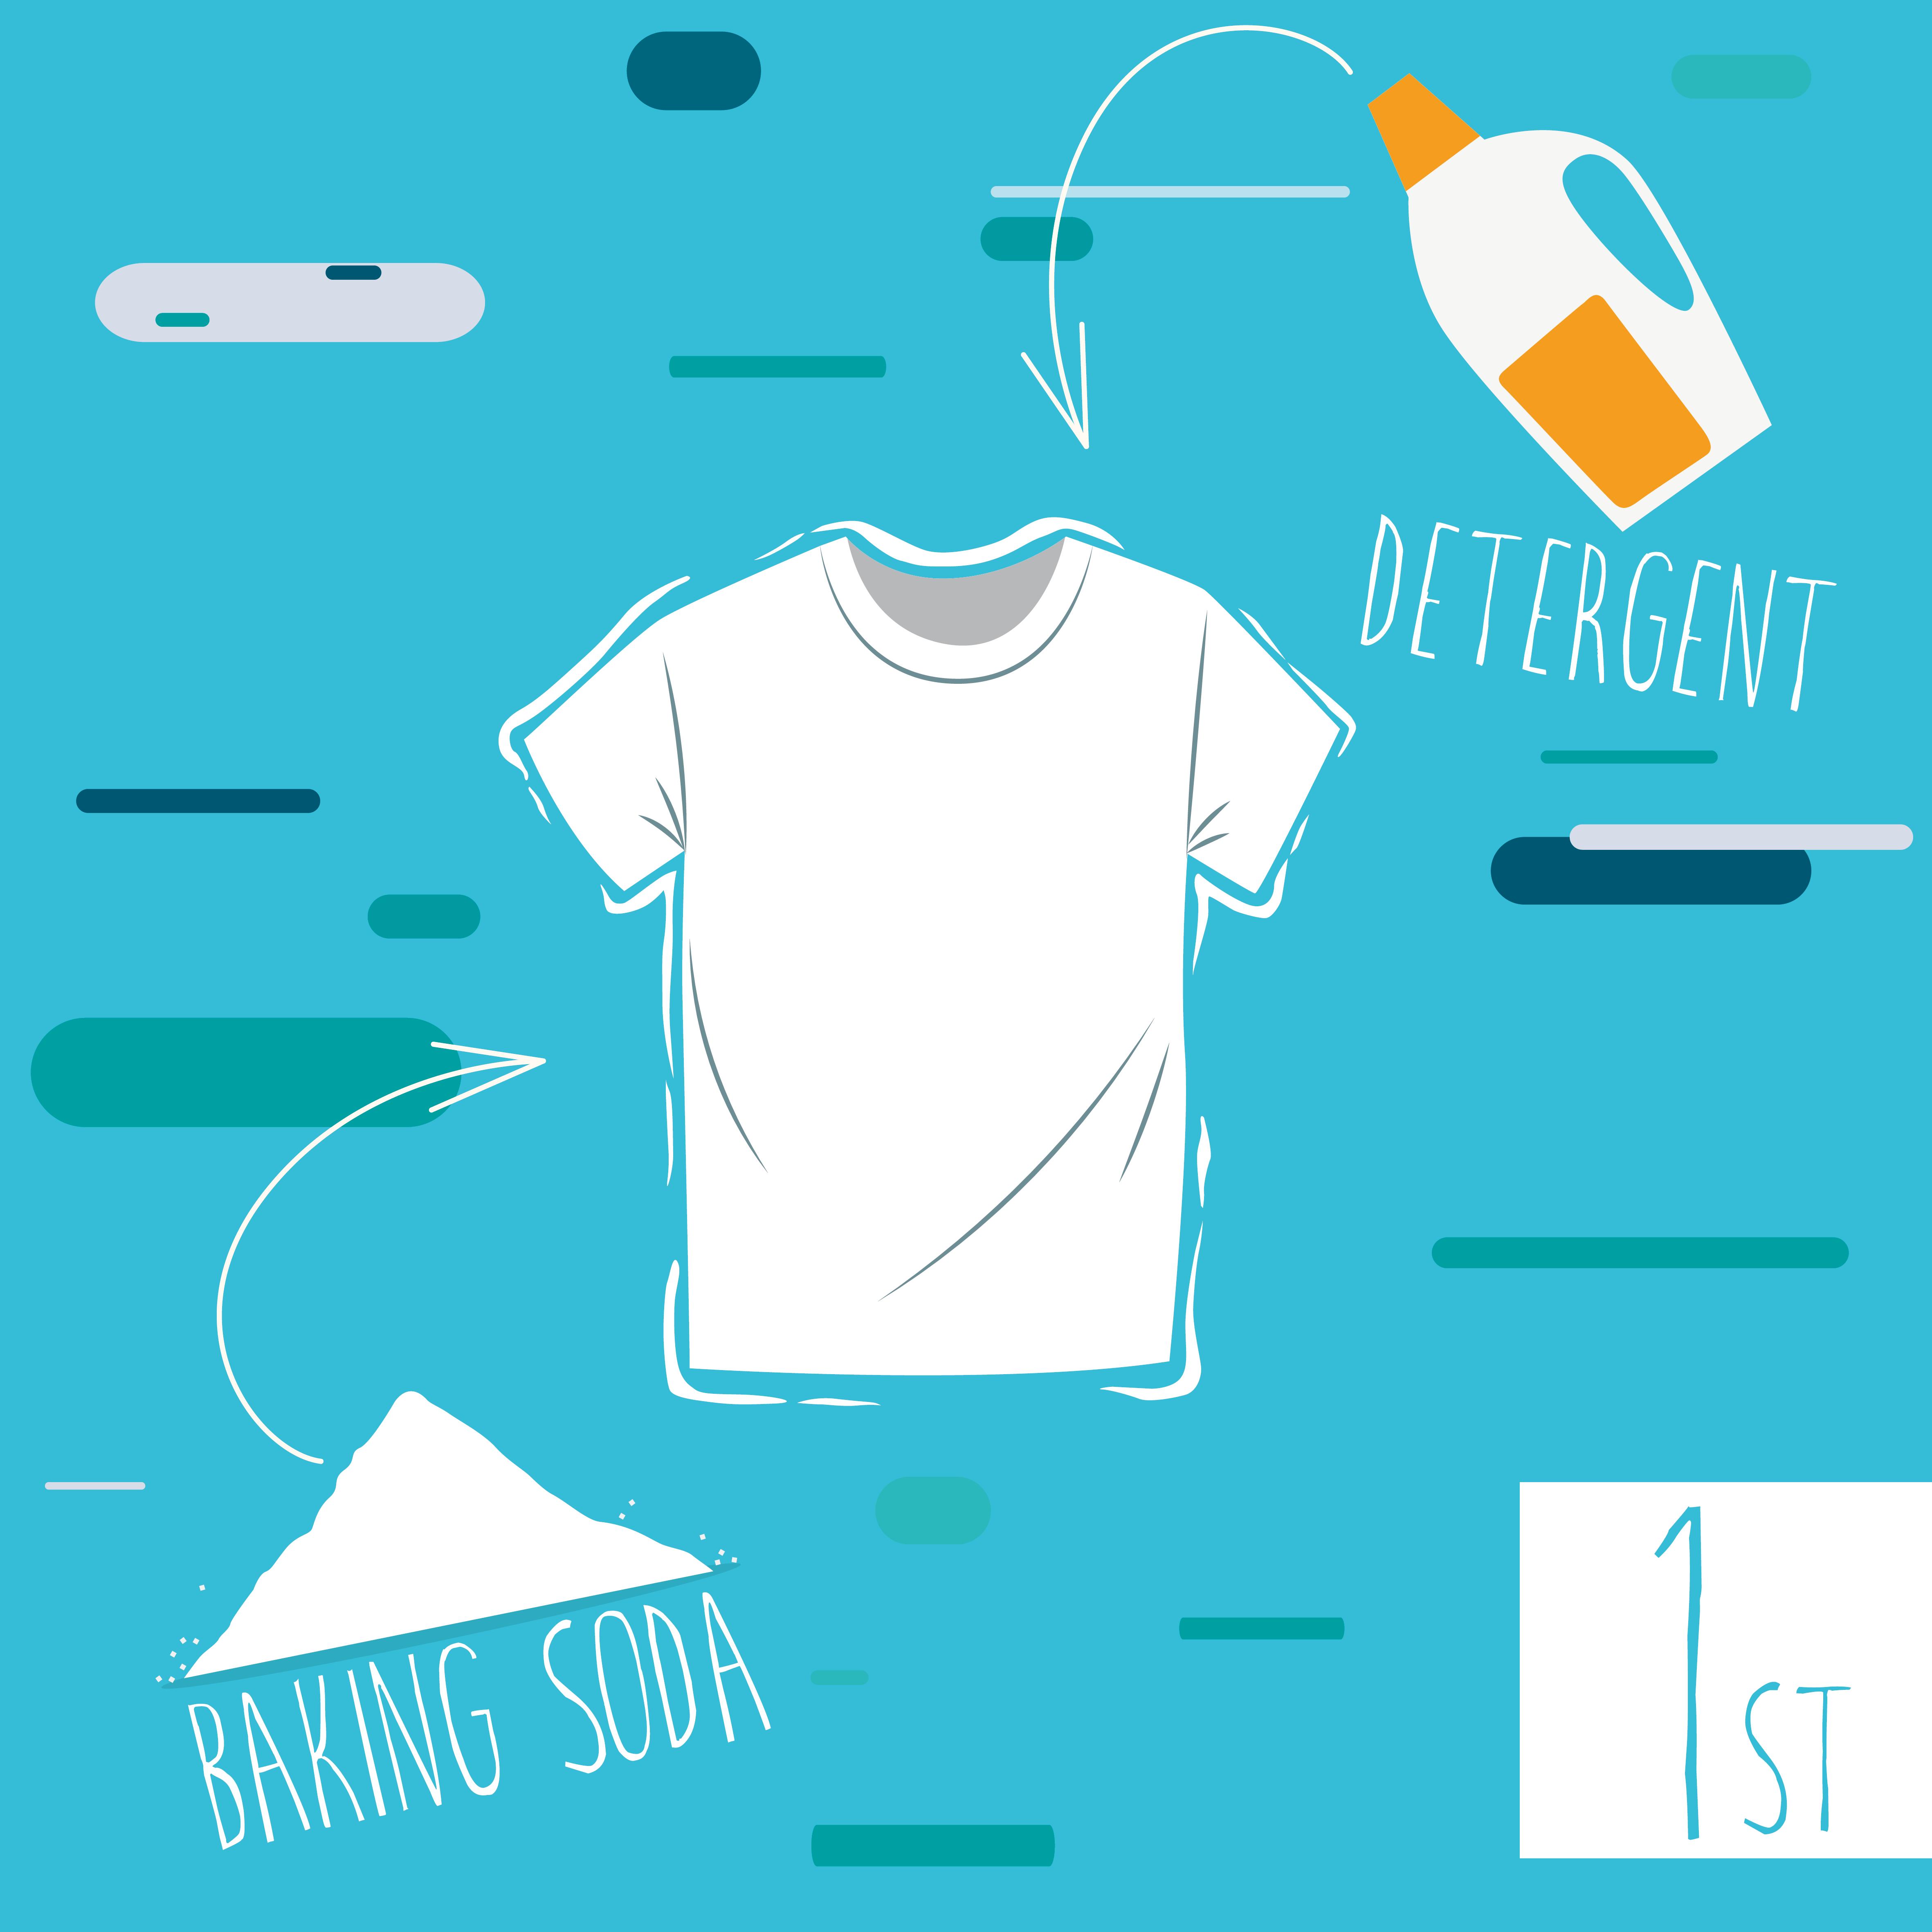 Black t shirt tambah lagi - Jika Akan Memulai Mencuci Tshirt Band Diharapkan Agar Memisahkan Tshirt Yang Gelap Dan Terang Tshirt Hitam Putih Berwarna Terang Dan Berwarna Gelap